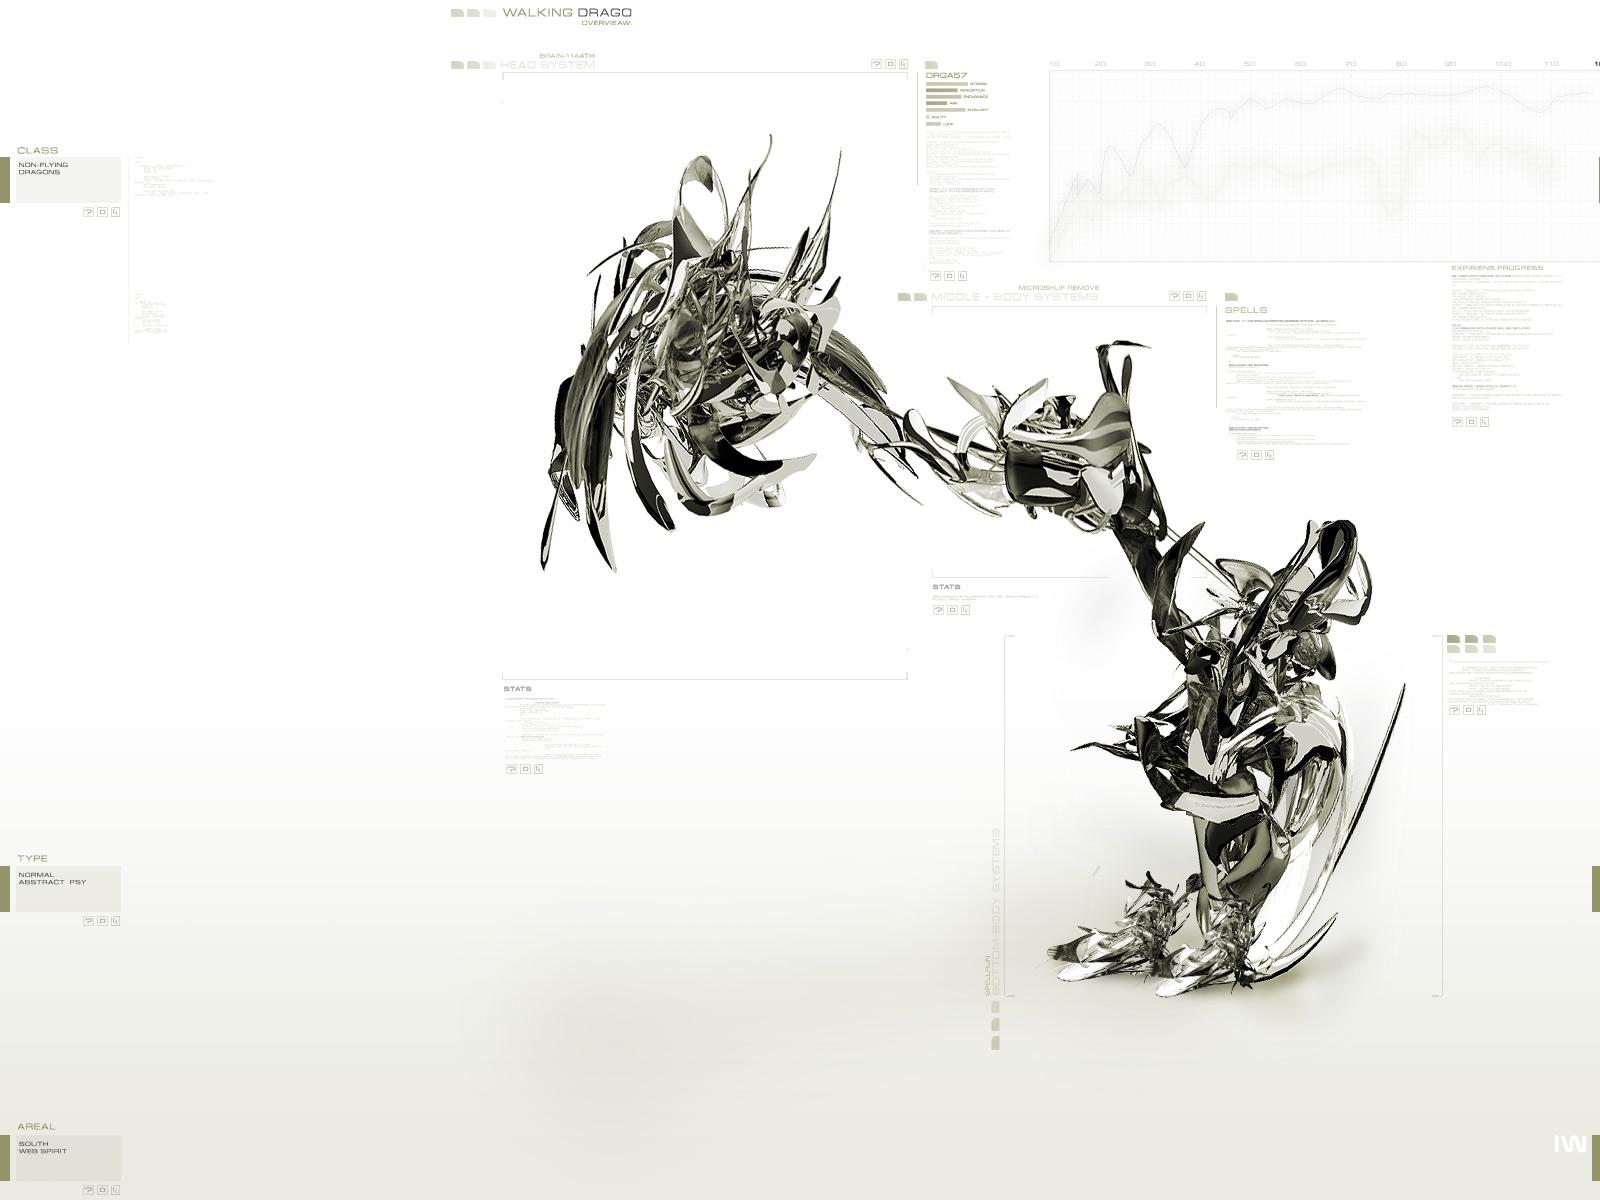 http://3.bp.blogspot.com/-WhFOfgr4Q3A/TWIrL00zz6I/AAAAAAAAC2k/gtms1fEGatY/s1600/Steampunk_Walking_Robot_Dragon.jpg